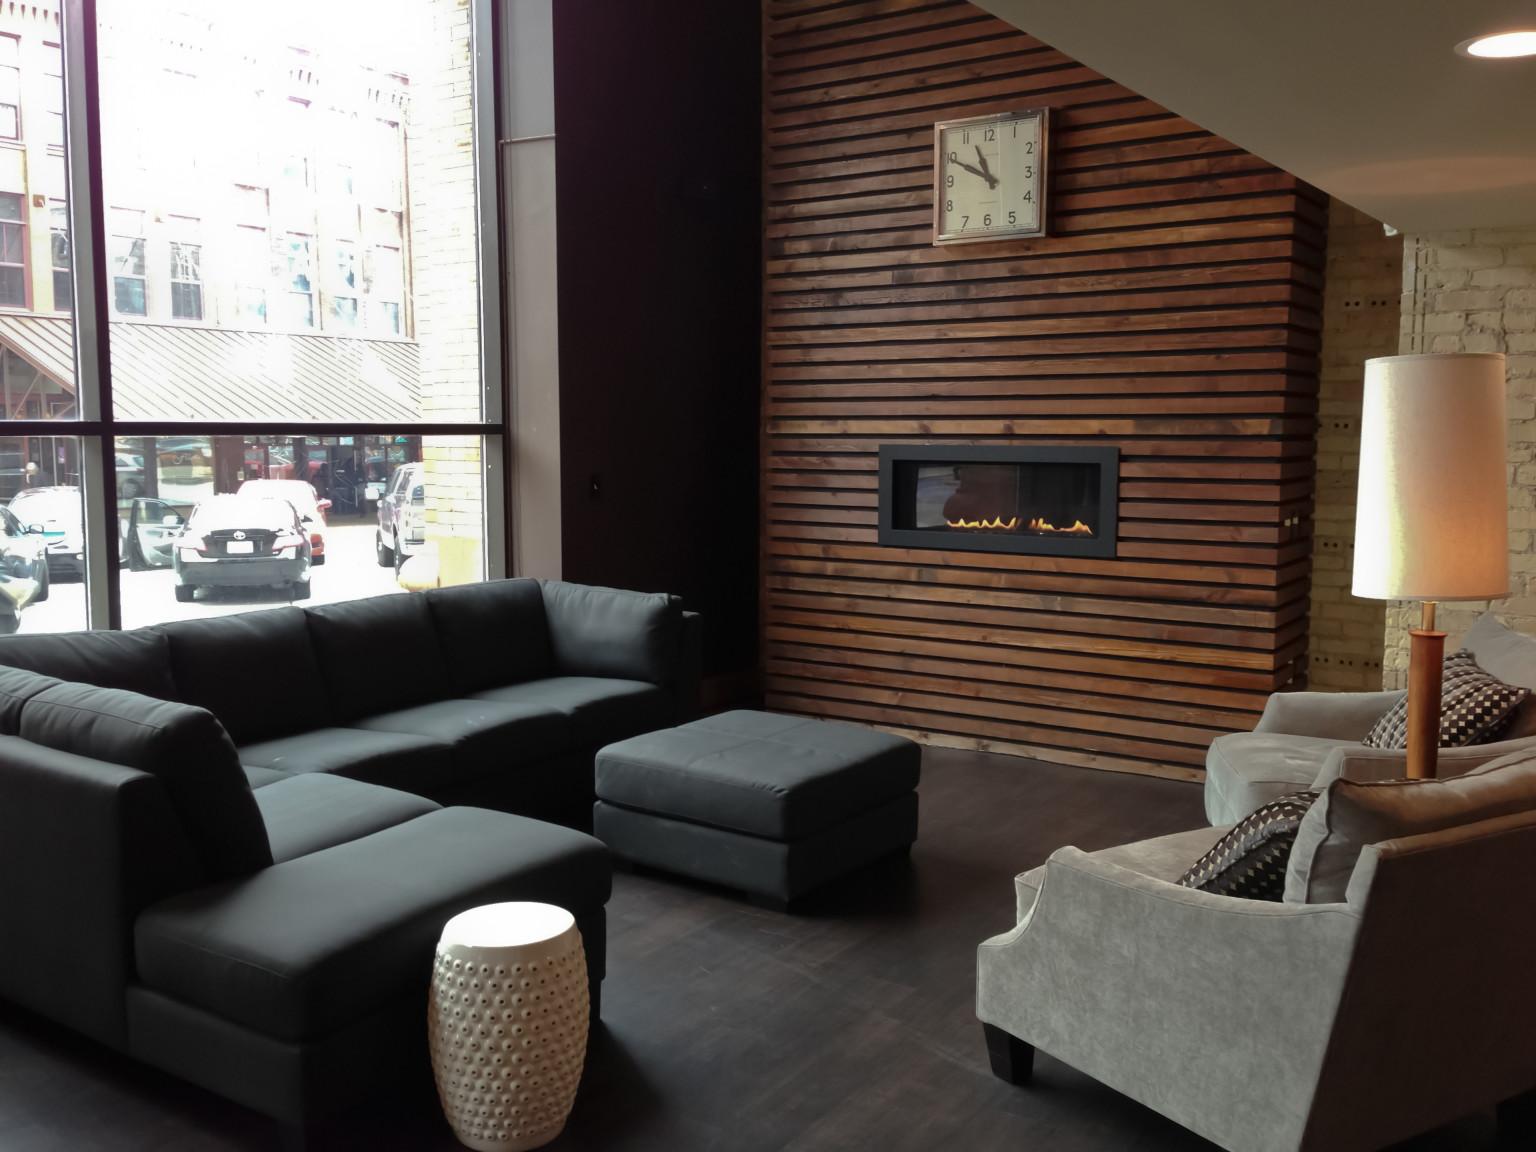 C_Hudson_I_Fireplace